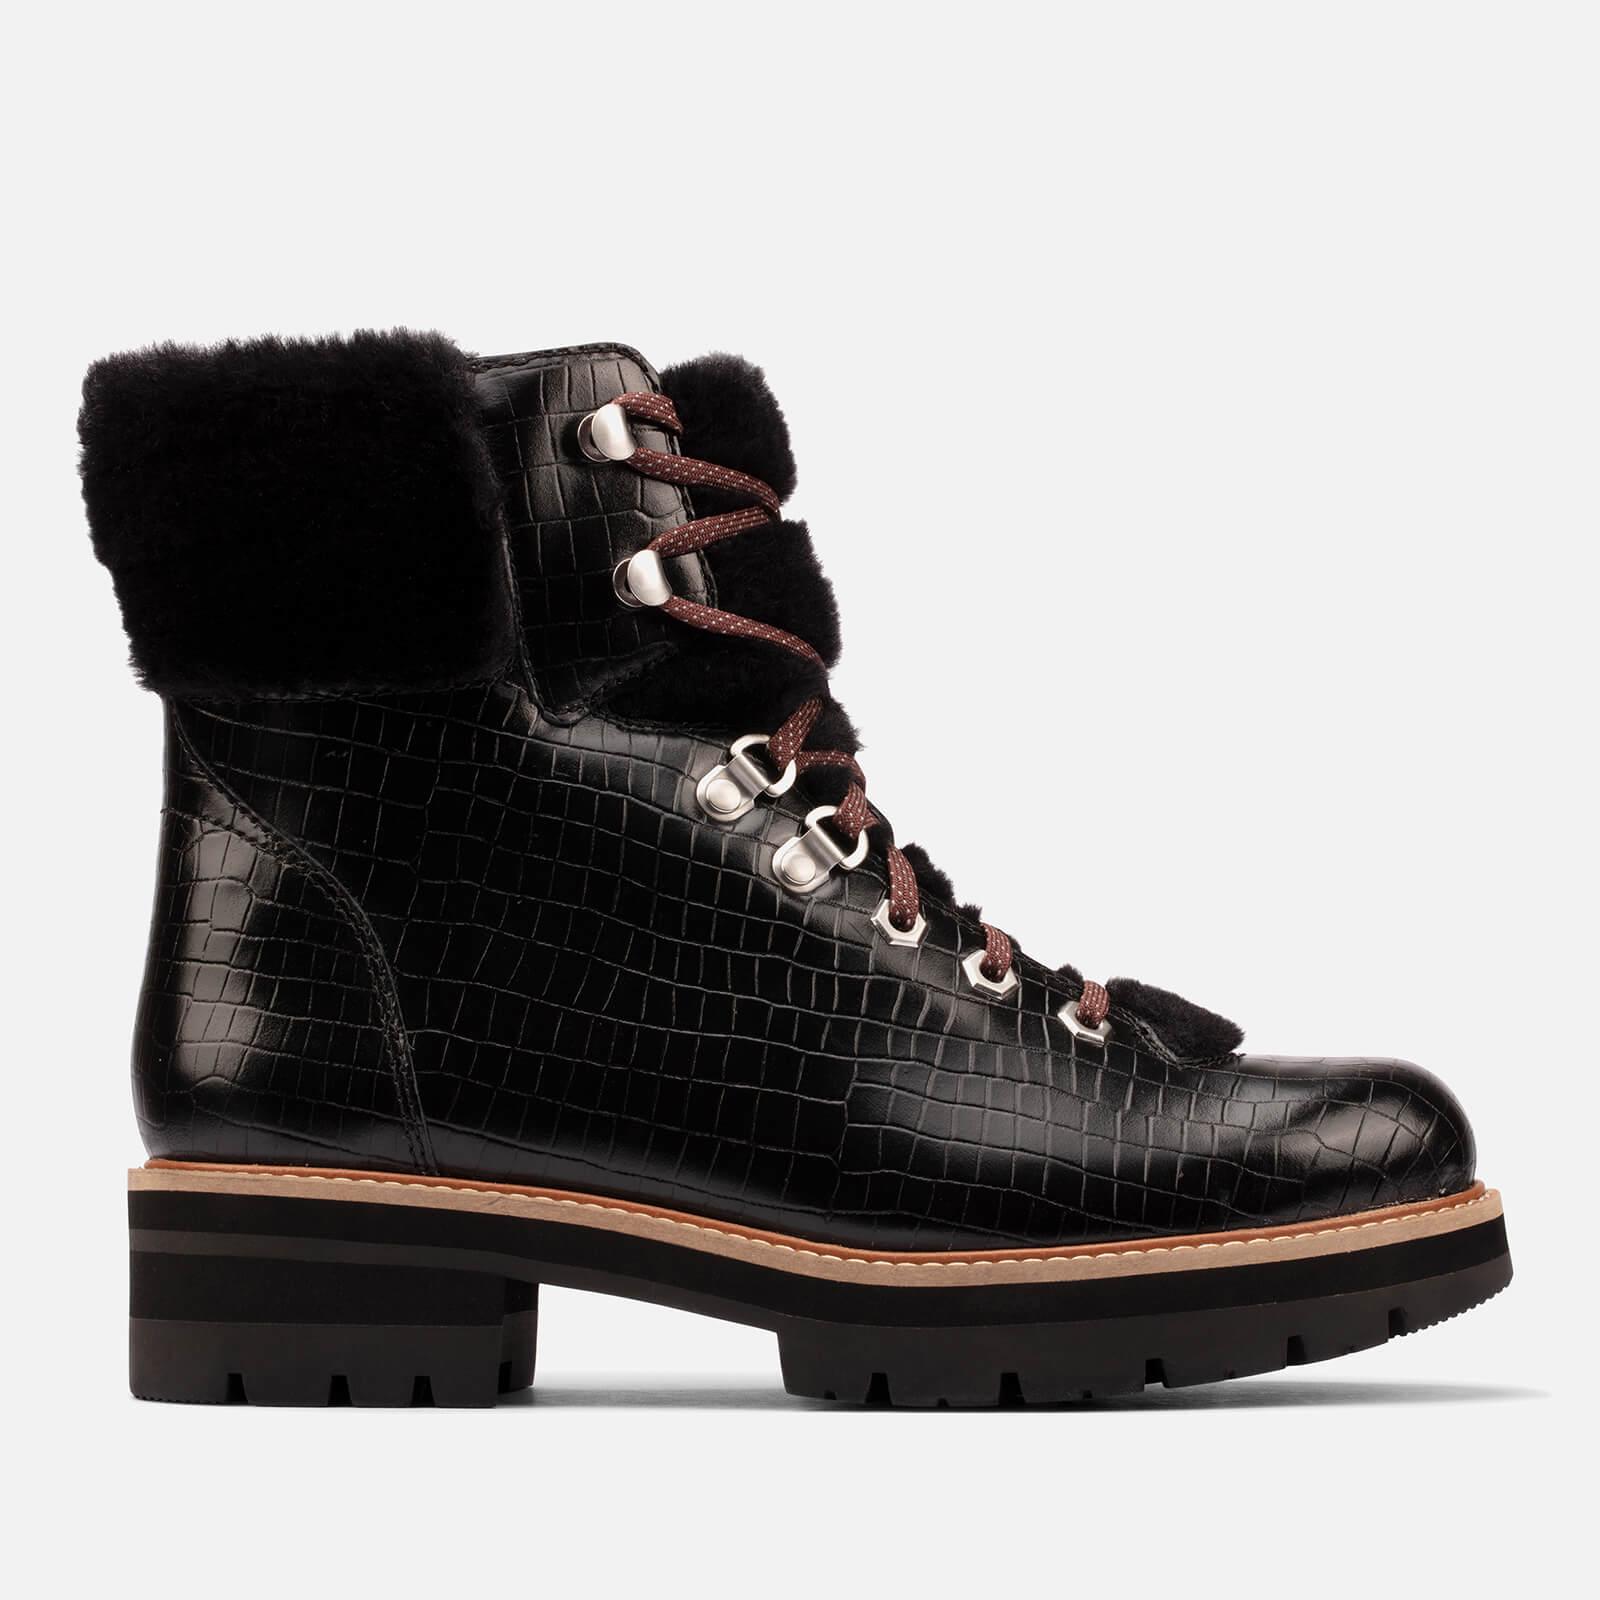 Clarks Women's Orianna Croc Print Leather Hiking Style Boots - Black - Uk 3